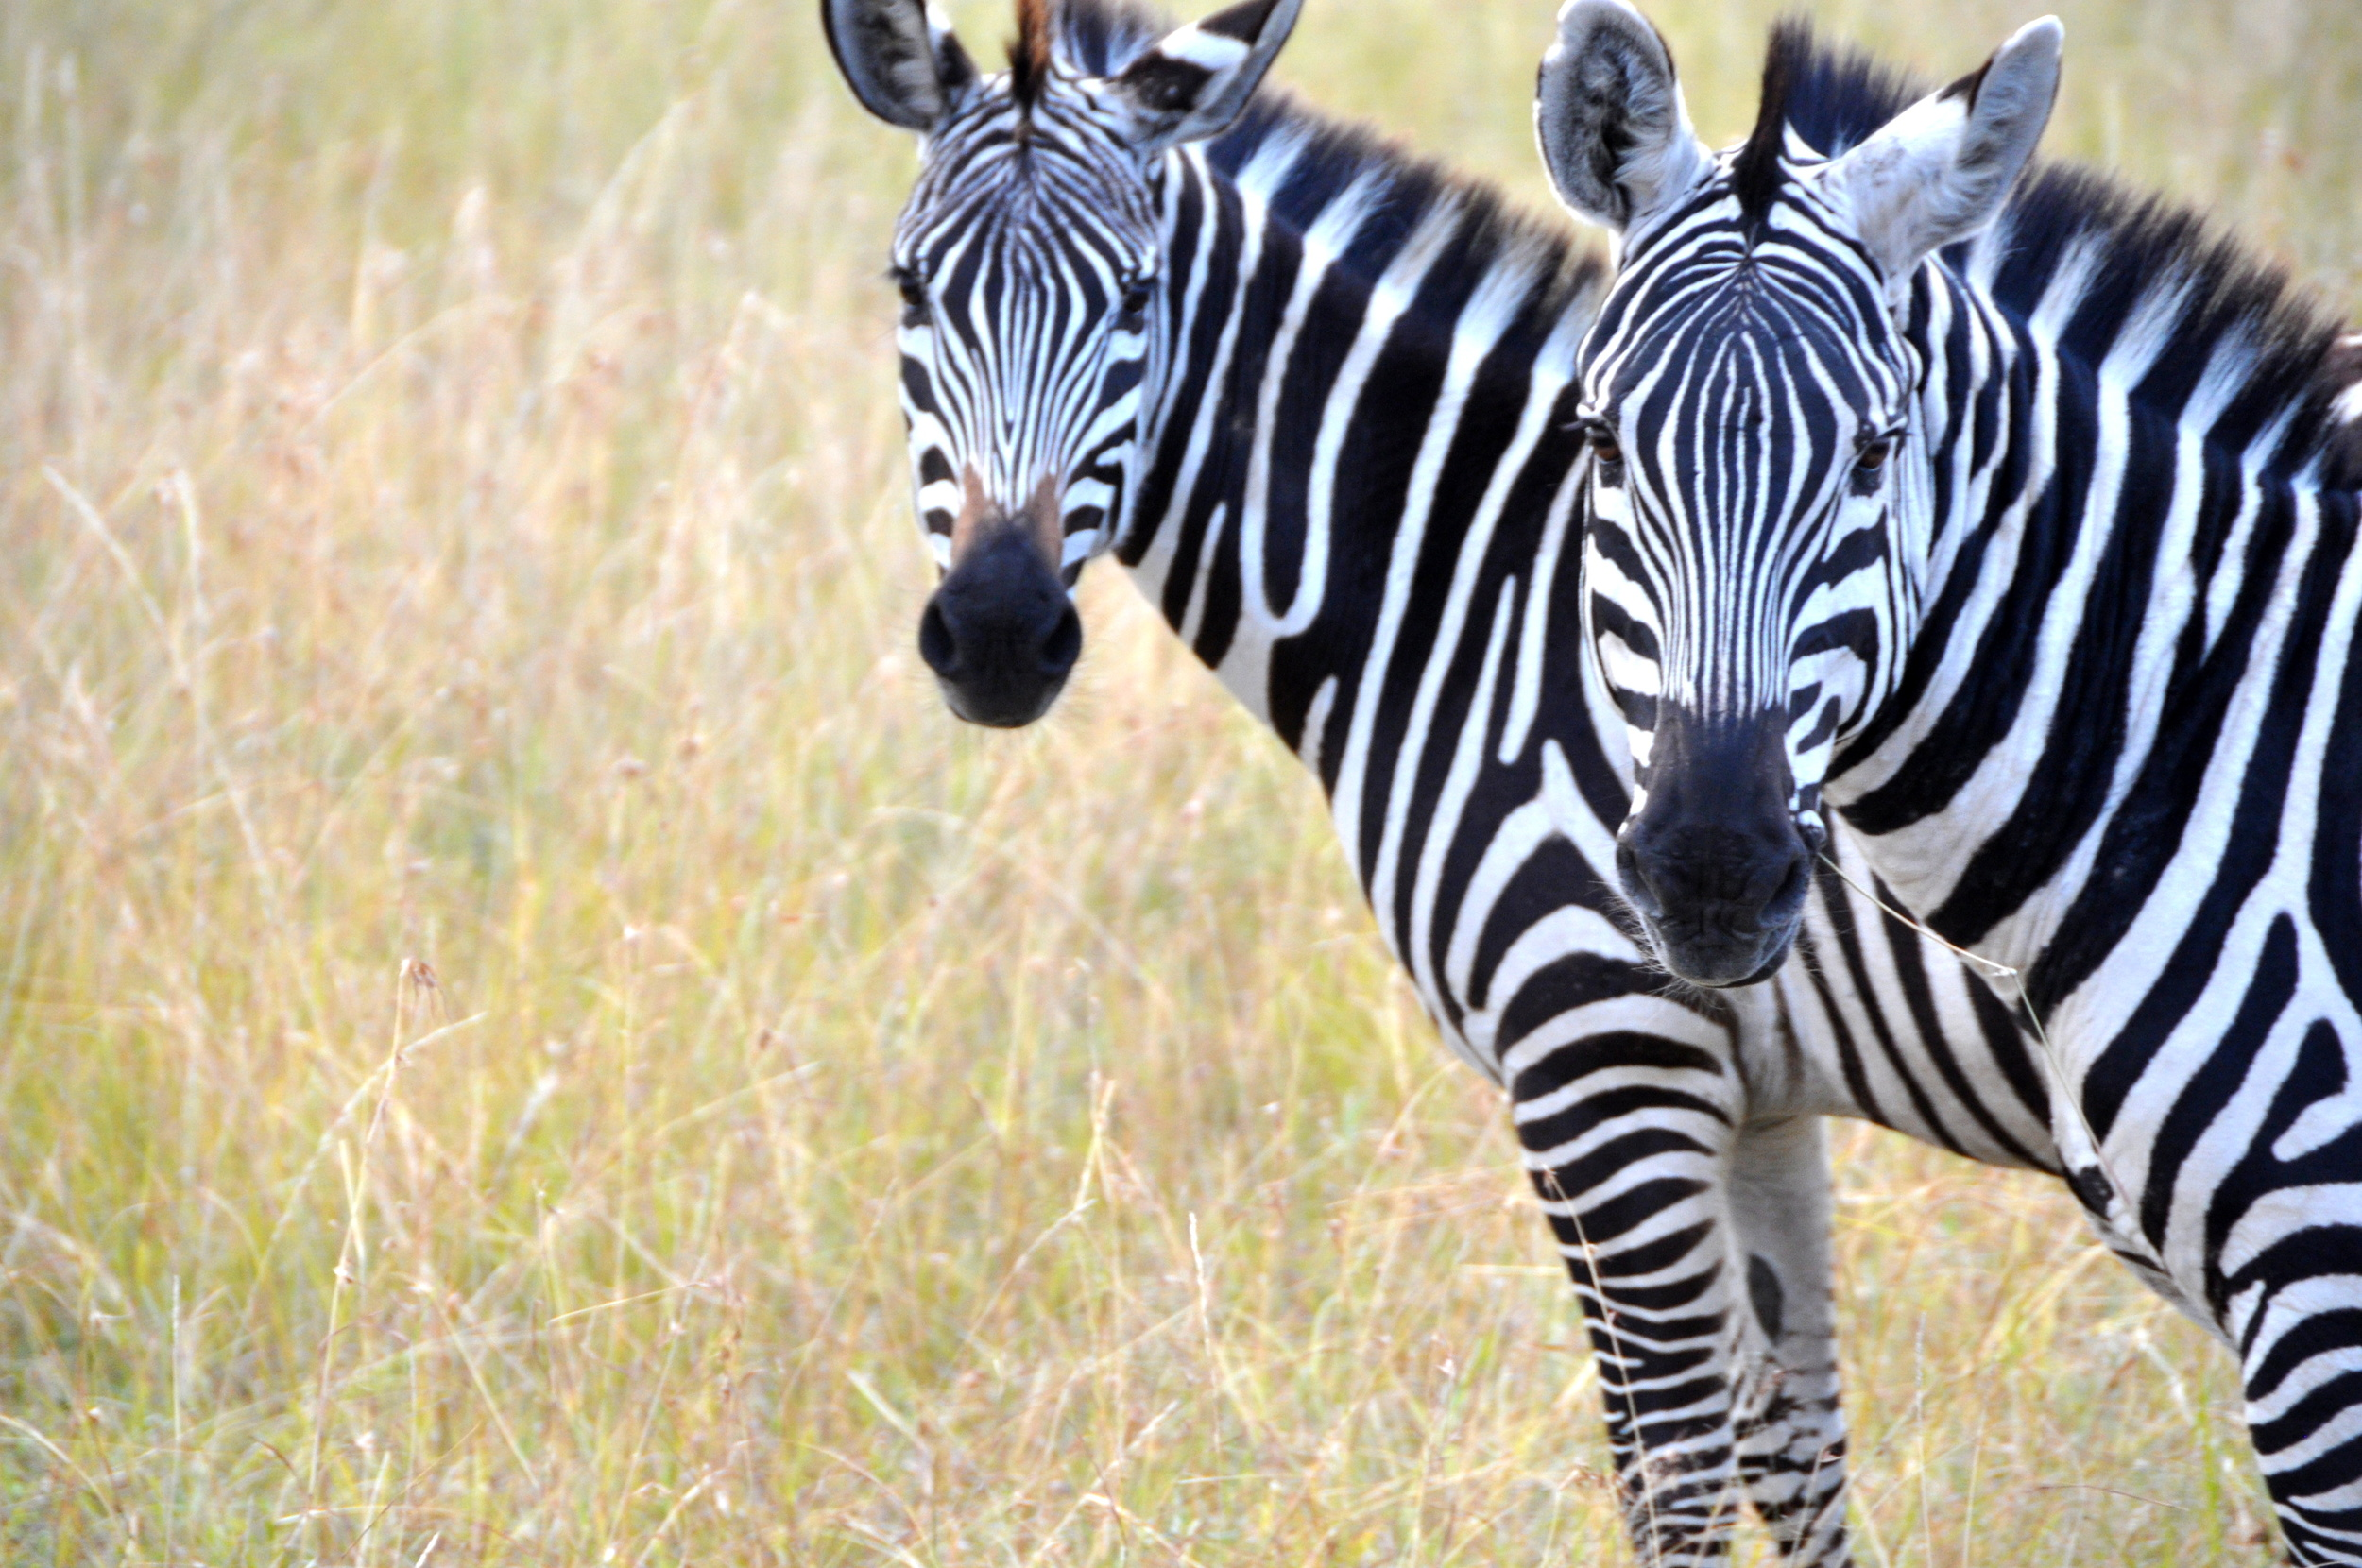 Zebras at Maasai Mara, Kenya, Africa